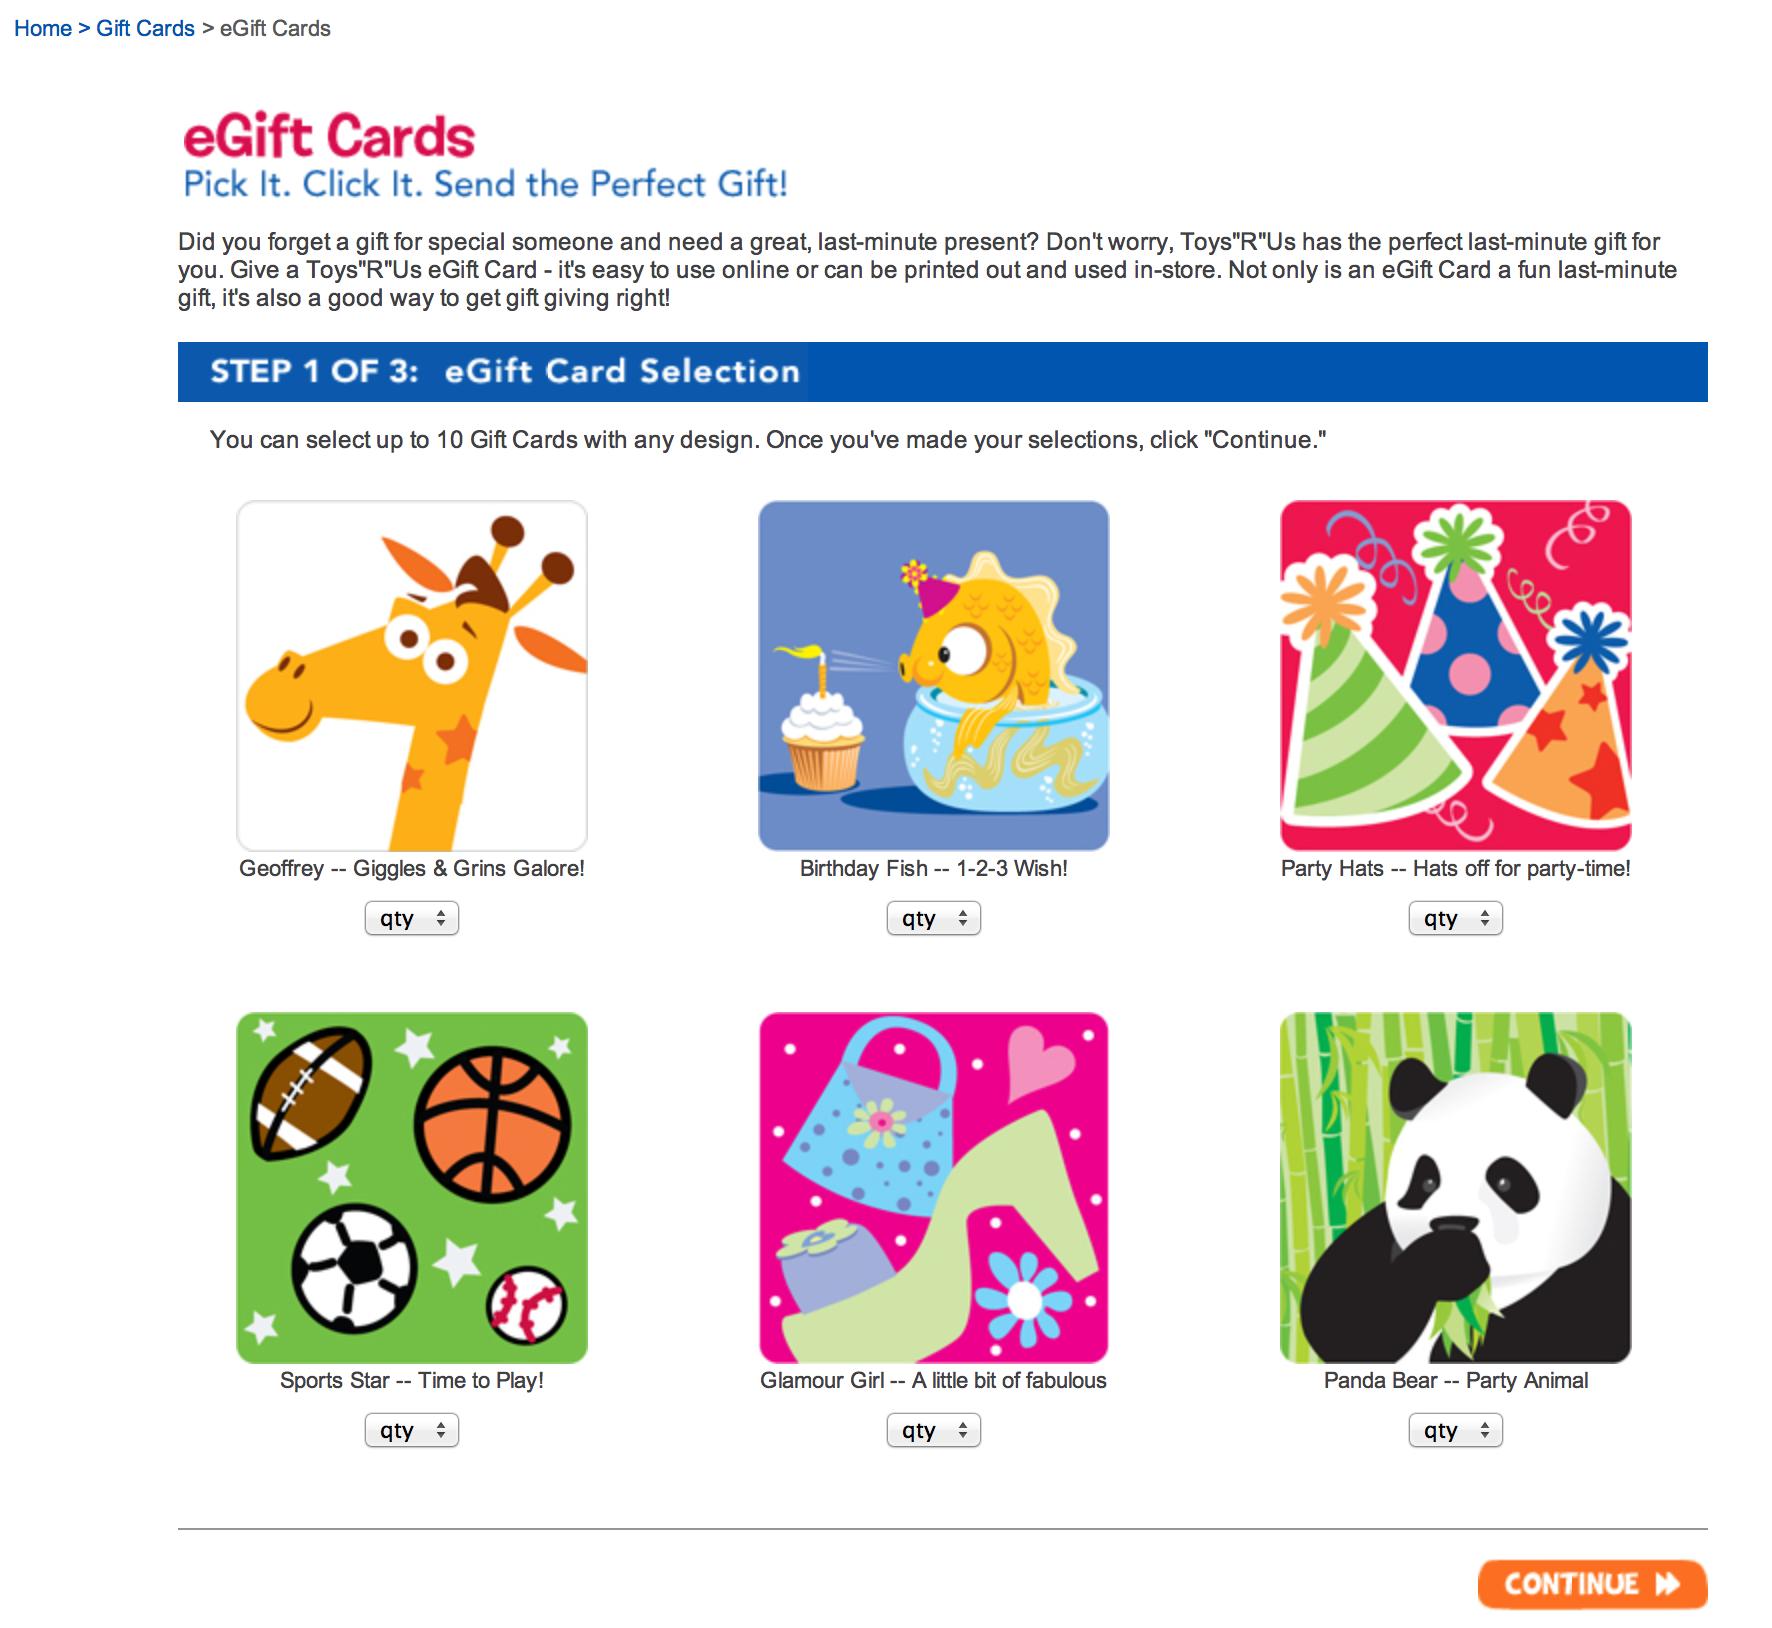 Website: eGift Cards